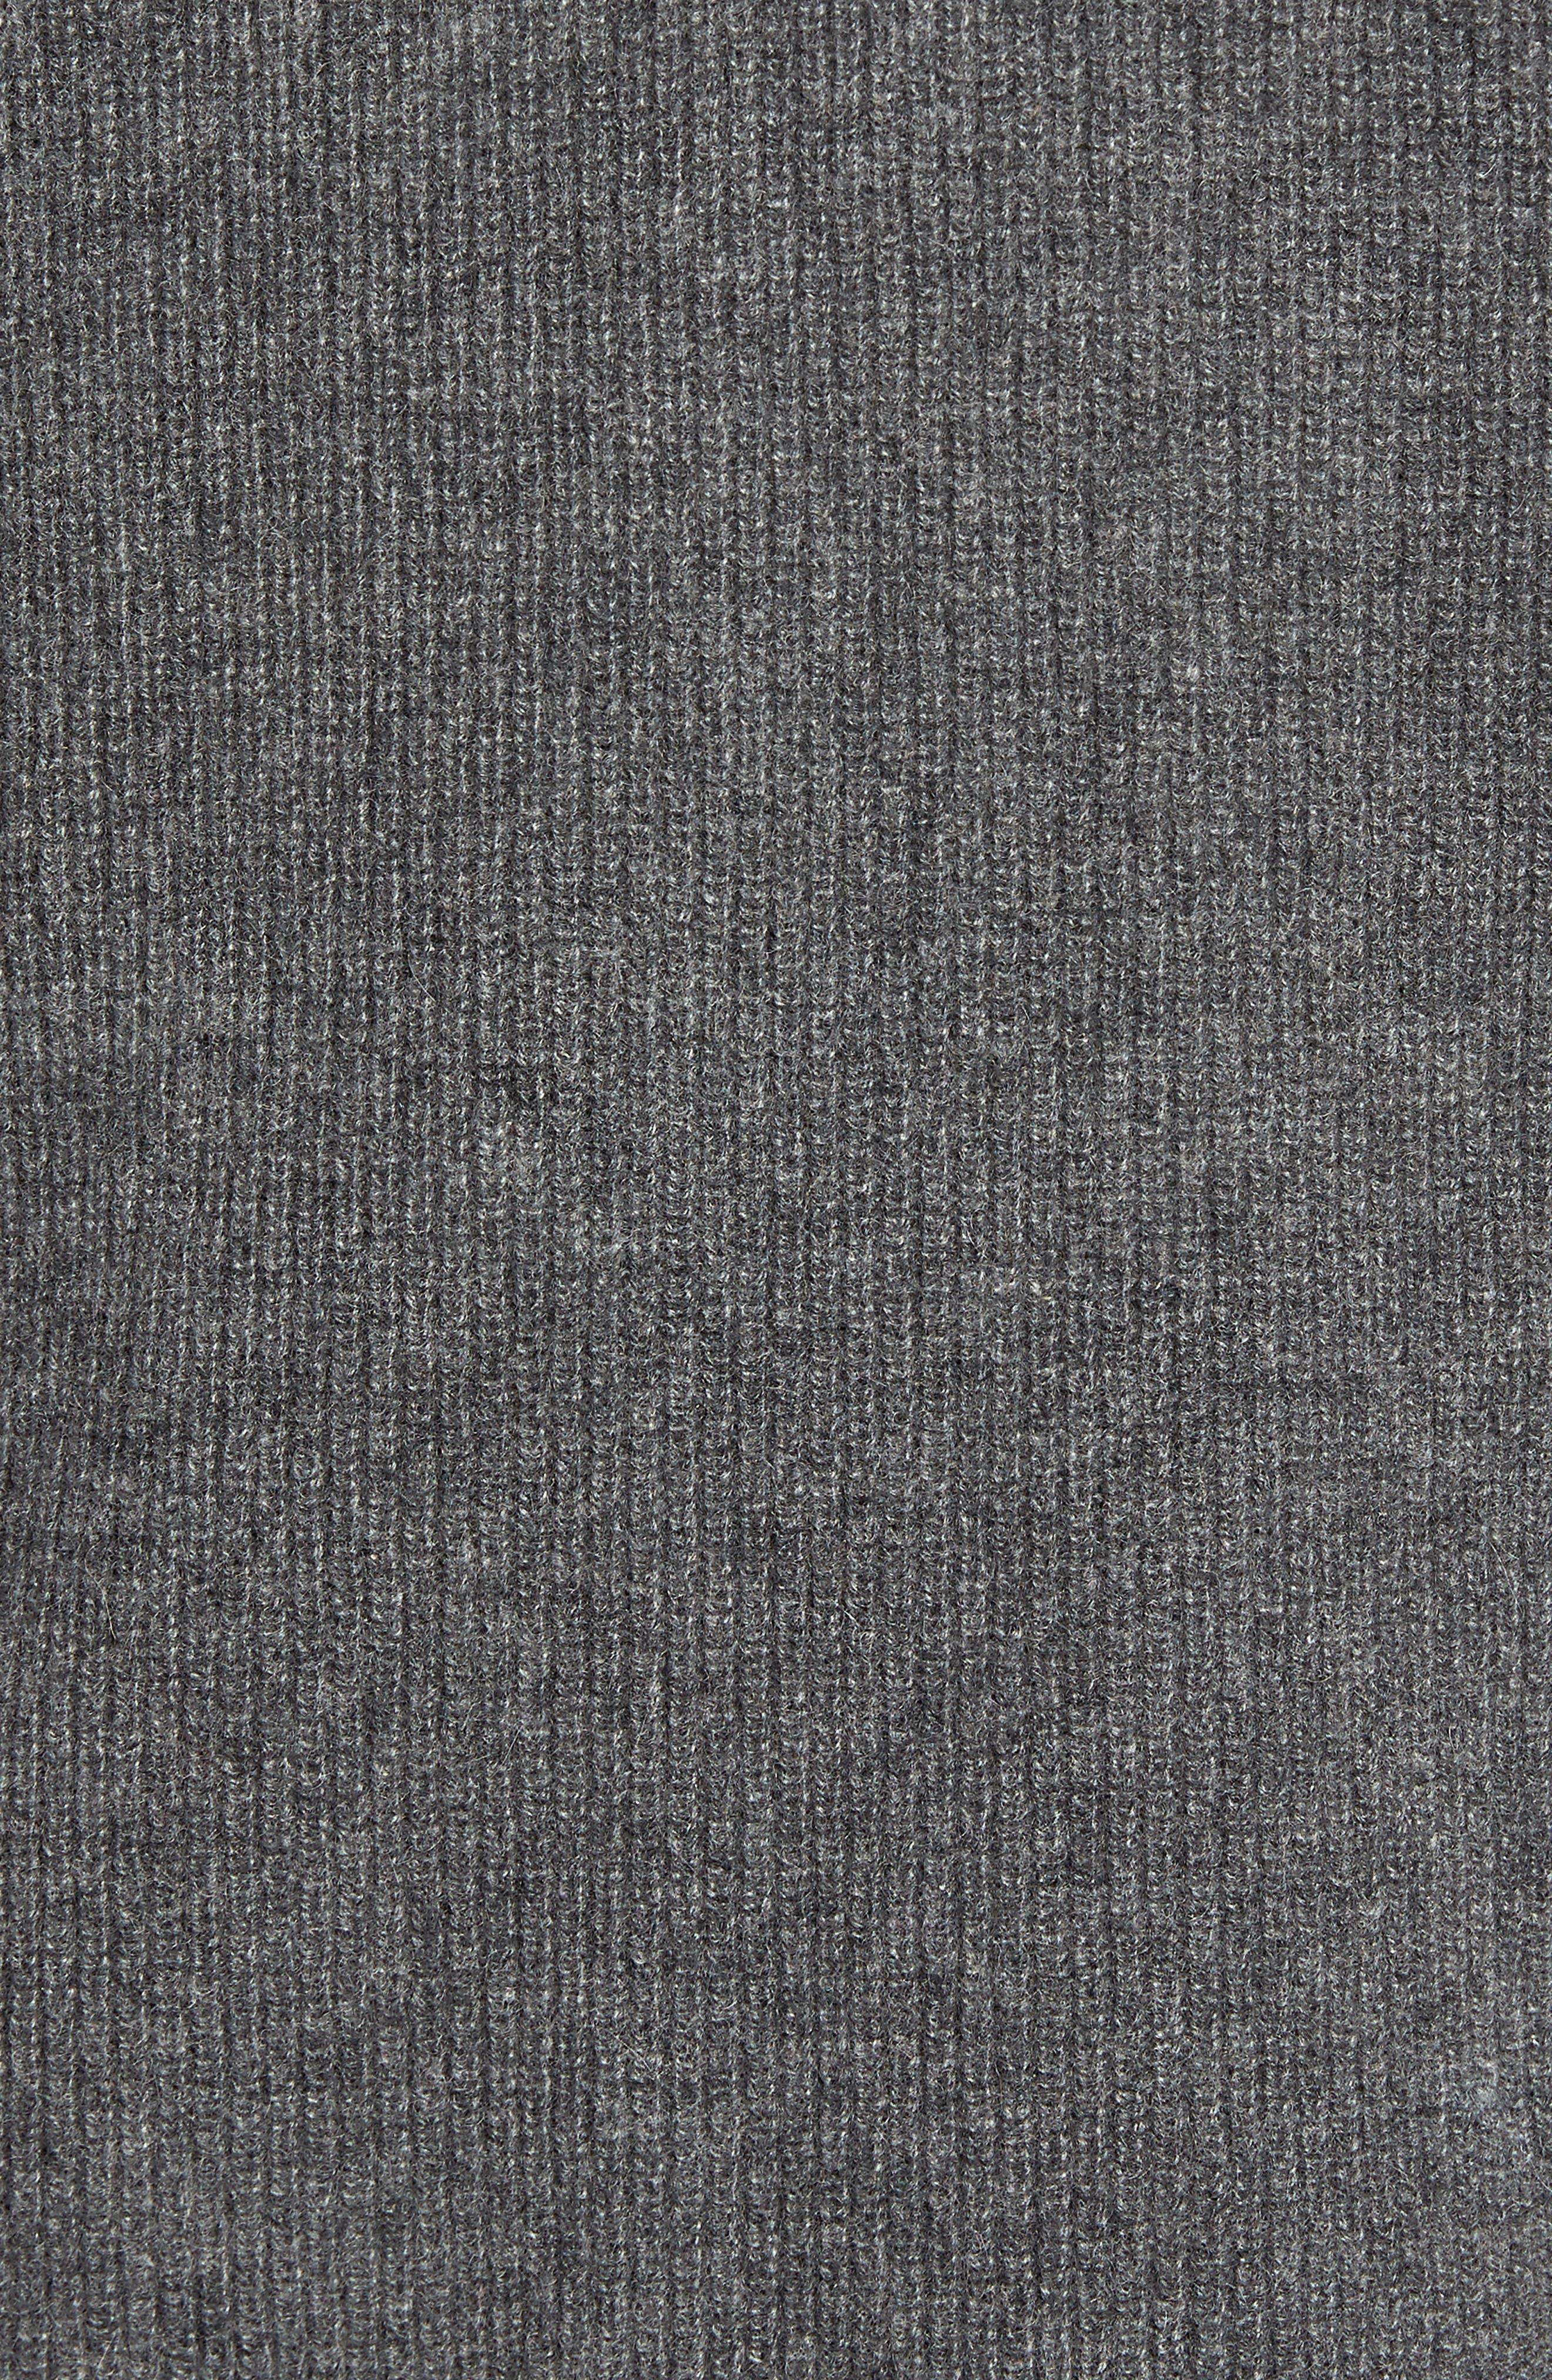 Stripe Sleeve Cashmere Sweater,                             Alternate thumbnail 5, color,                             DARK GREY